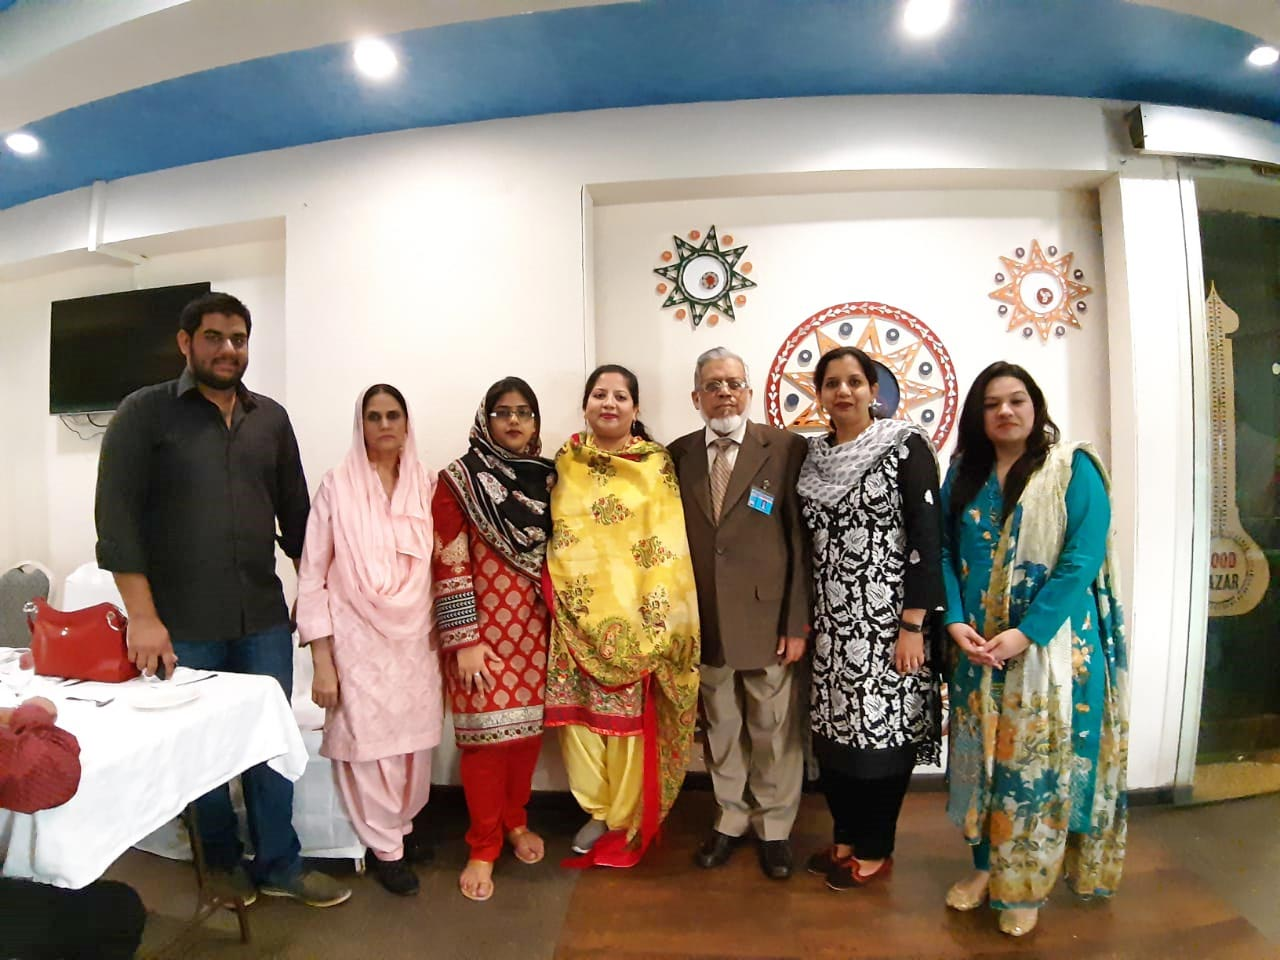 Engr. Taha Khan, Mrs. Rudaba Irshad, Bushra Irshad, Dr. Kiran A. Rehman, Engr. Iqbal A. Khan, Erum Imran, Faryal Khan